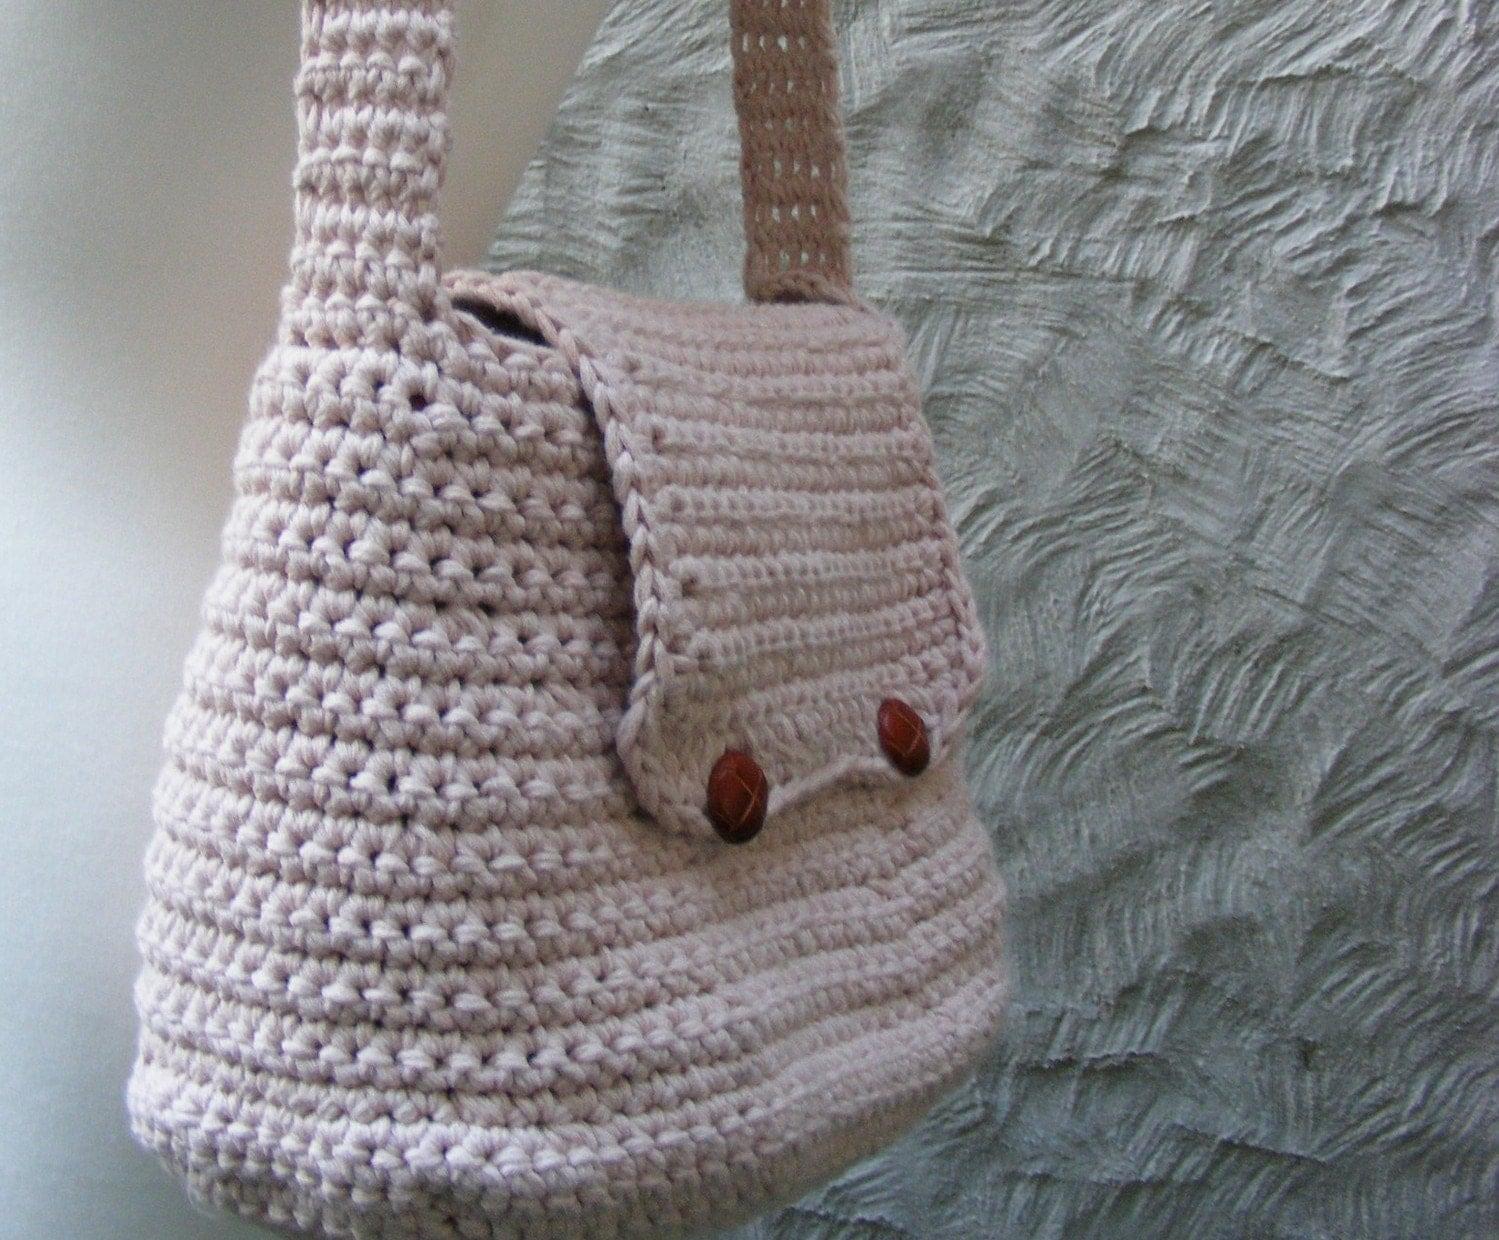 Free crochet pattern for messenger bag dancox for messenger bag crochet pattern tutorial crochet purse bankloansurffo Images